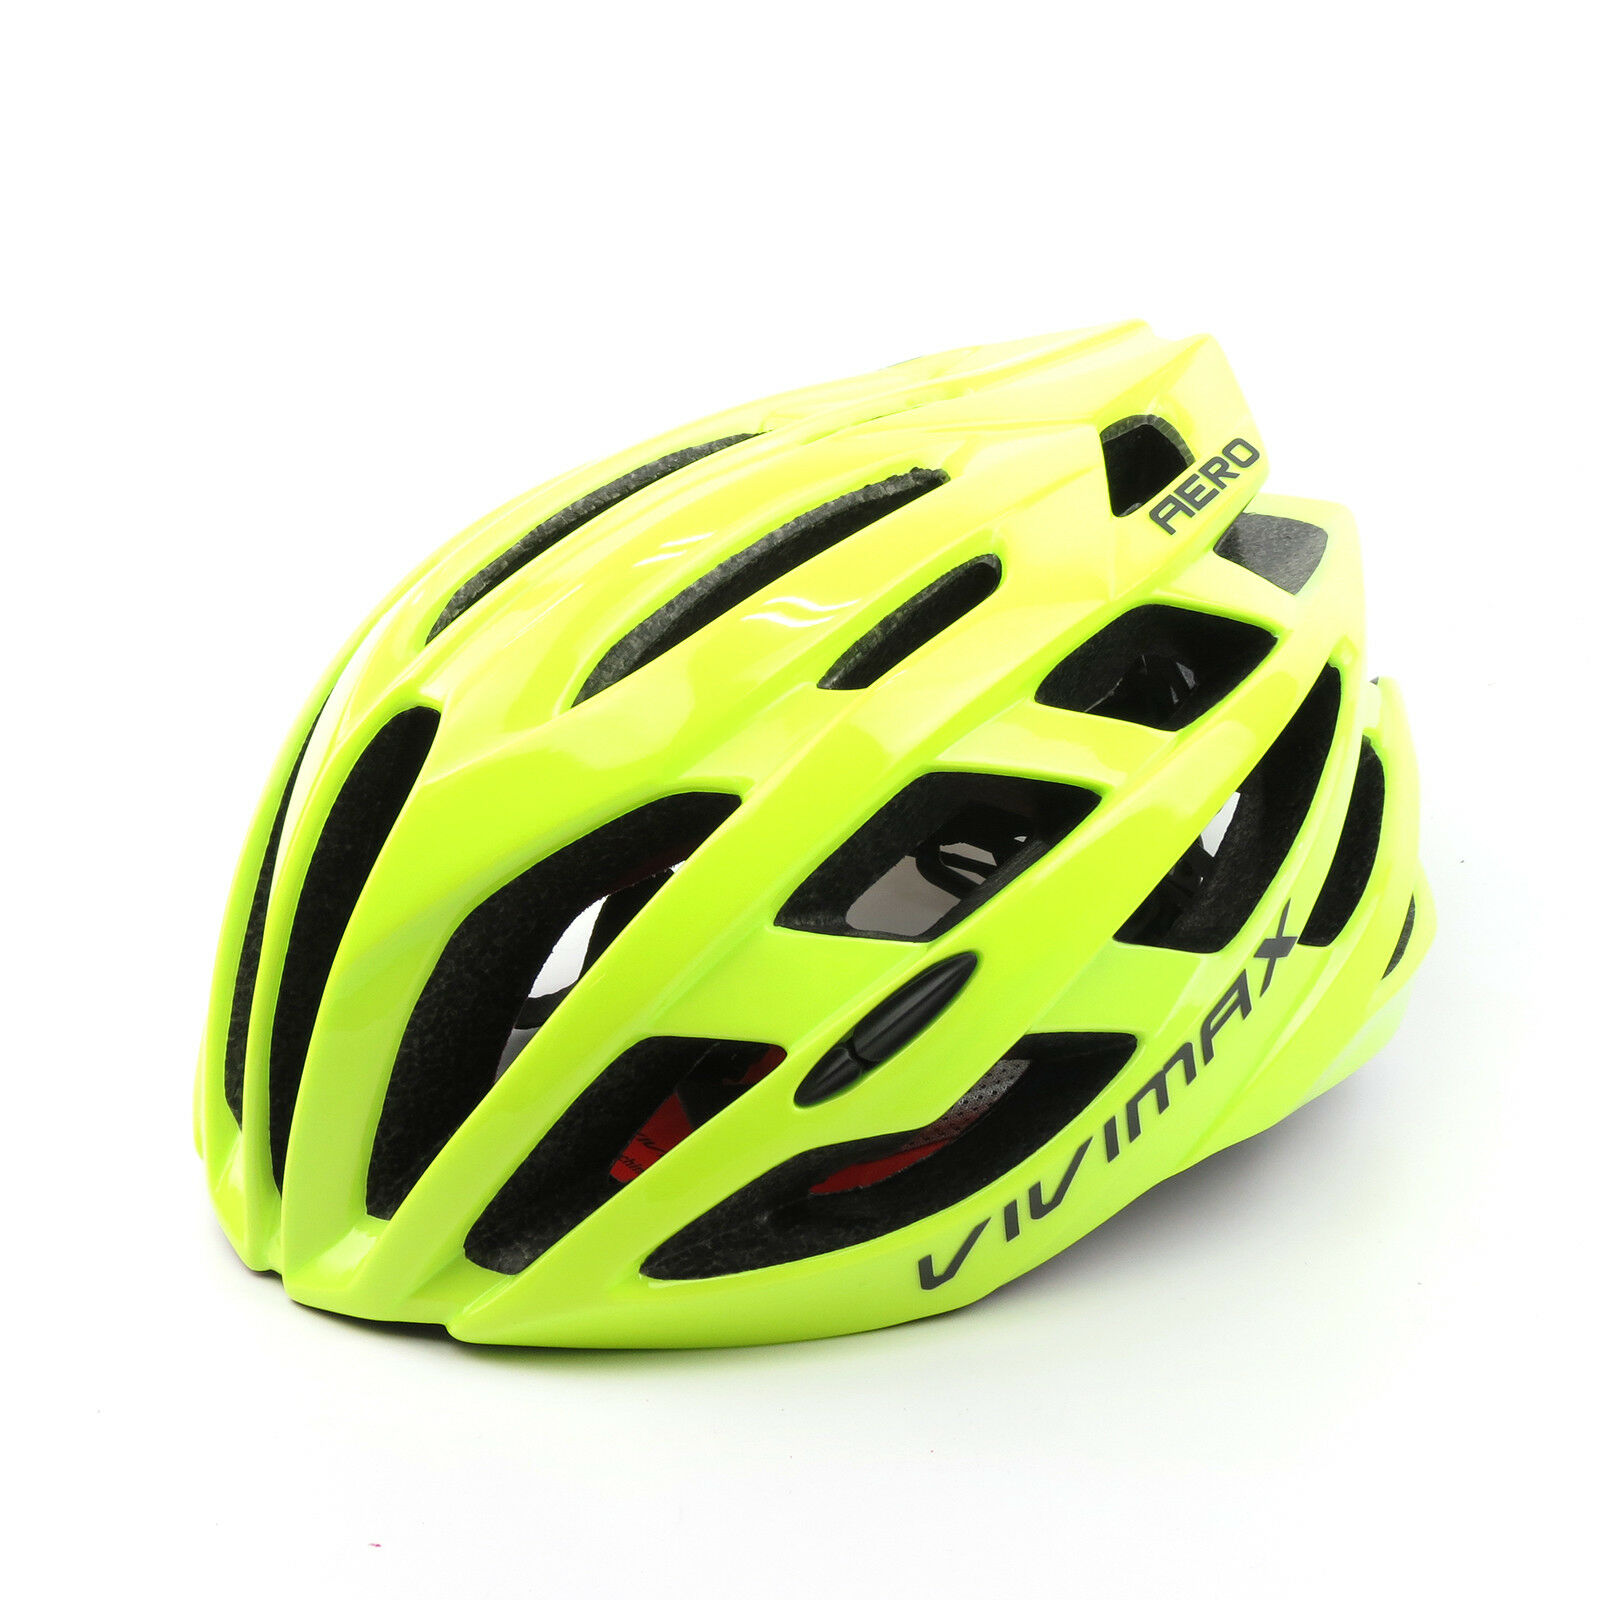 VIVIMAX Aero Road Bike Bicycle Cycling Helmet L  XL 58-62cm - Fluorescent Green  first-class service